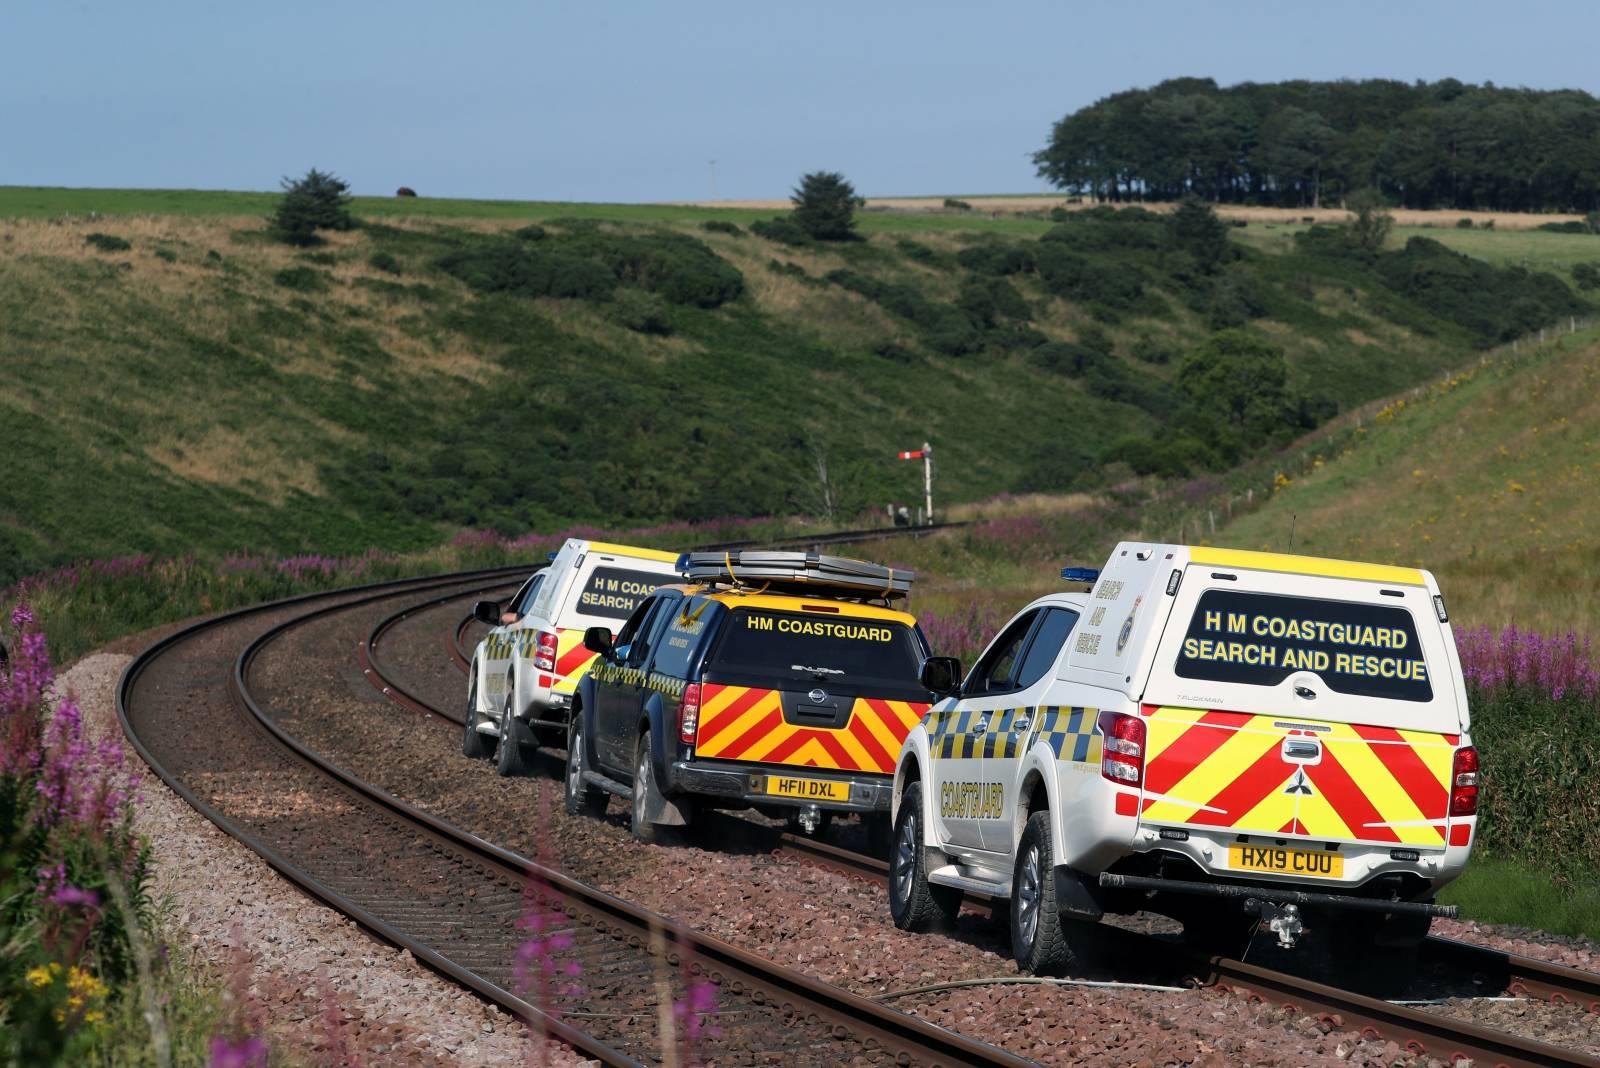 Passenger train derails near Stonehaven in Scotland